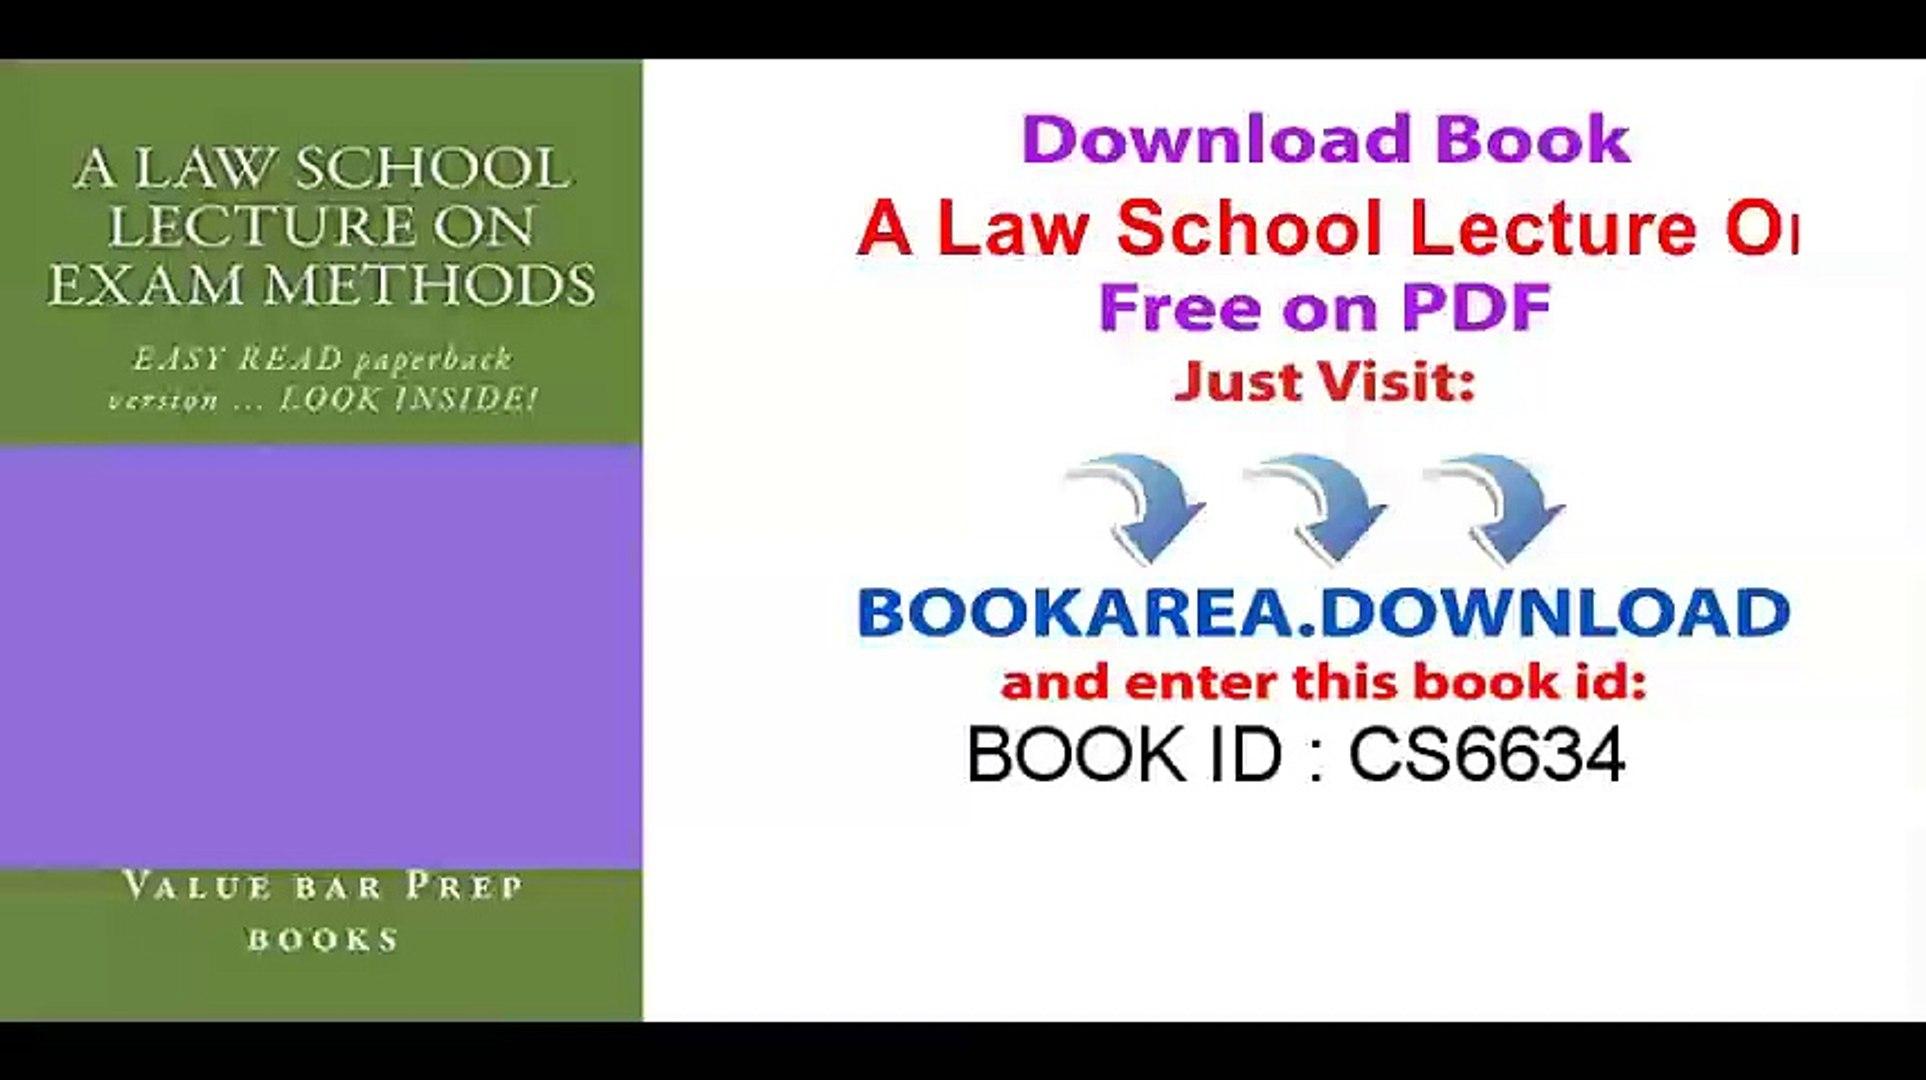 A Law School Lecture On Exam Methods (e book) (e borrowing OK)_ e book,  Ivy Black letter law books